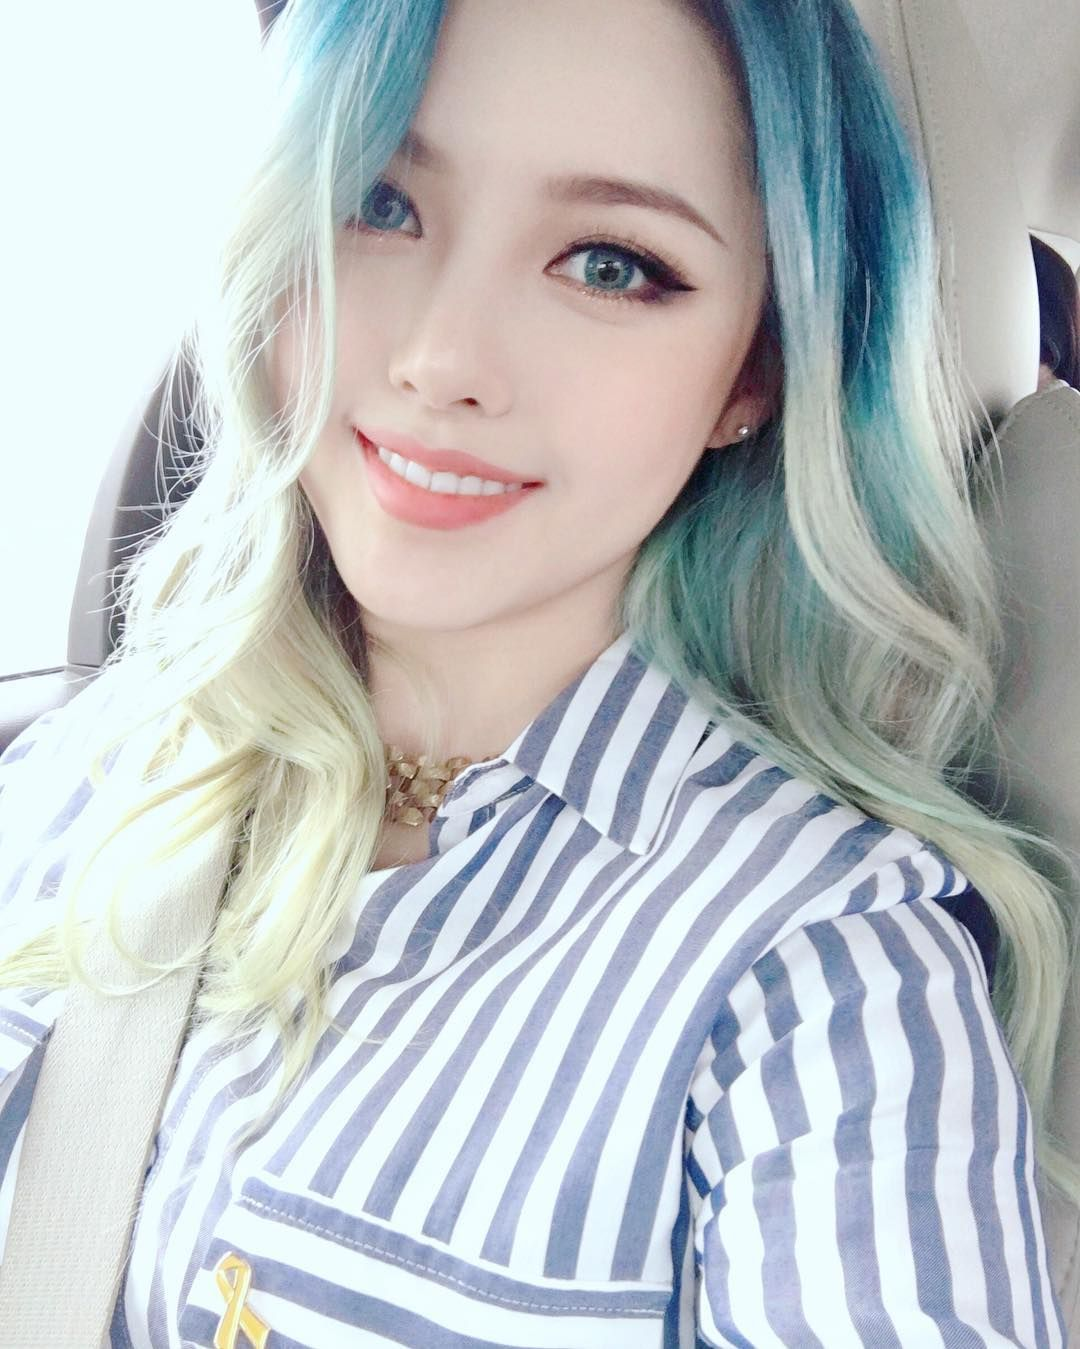 hair Korean girl with blue